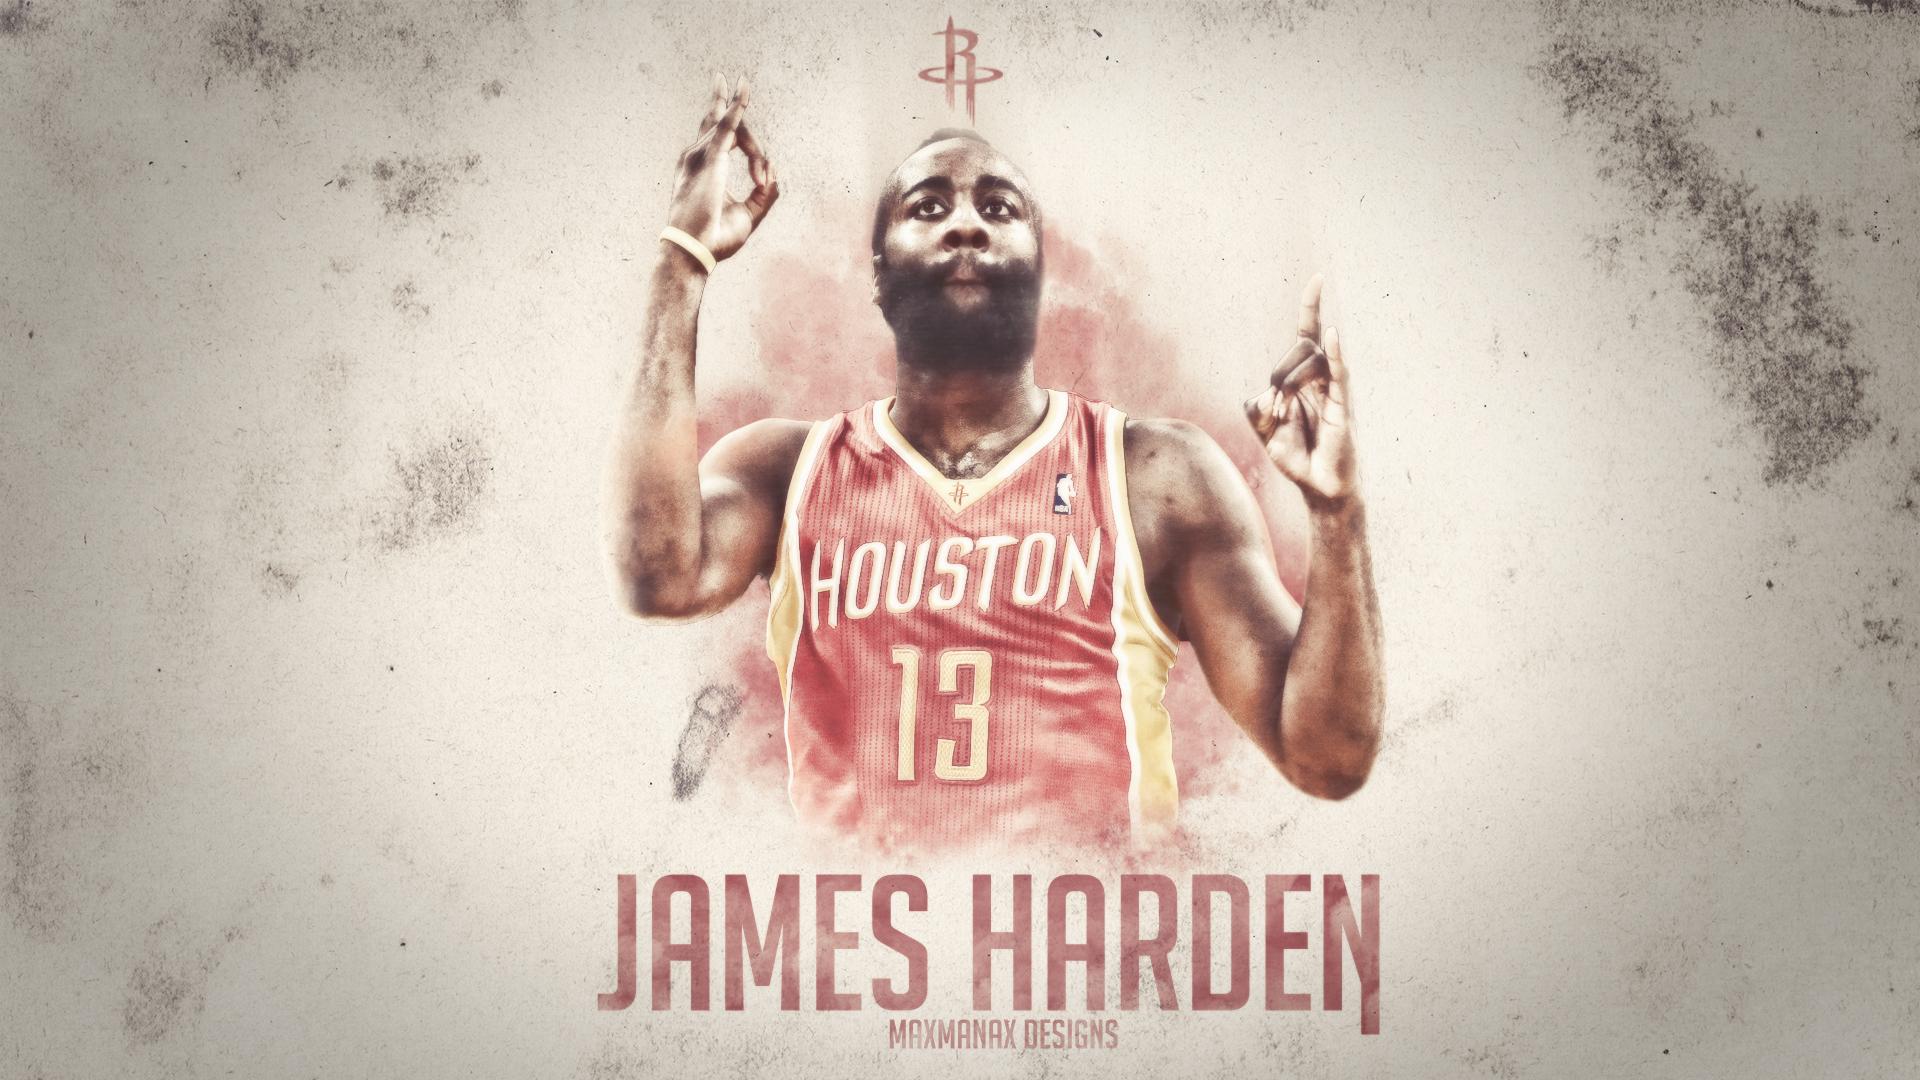 James Harden HD Wallpaper